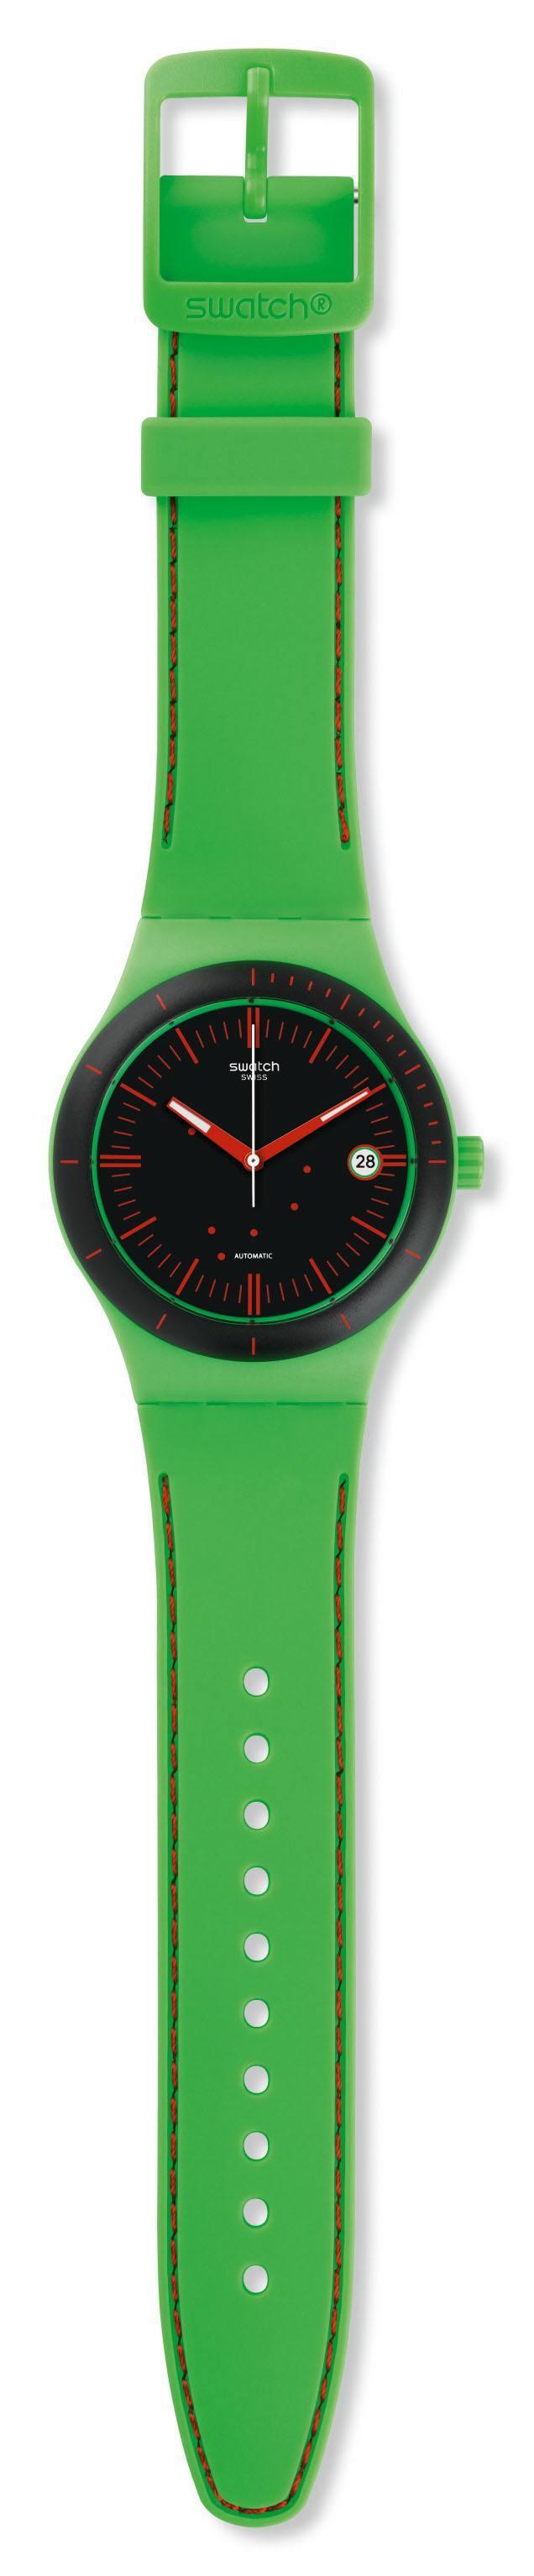 Swatch: Sistem51 Frog